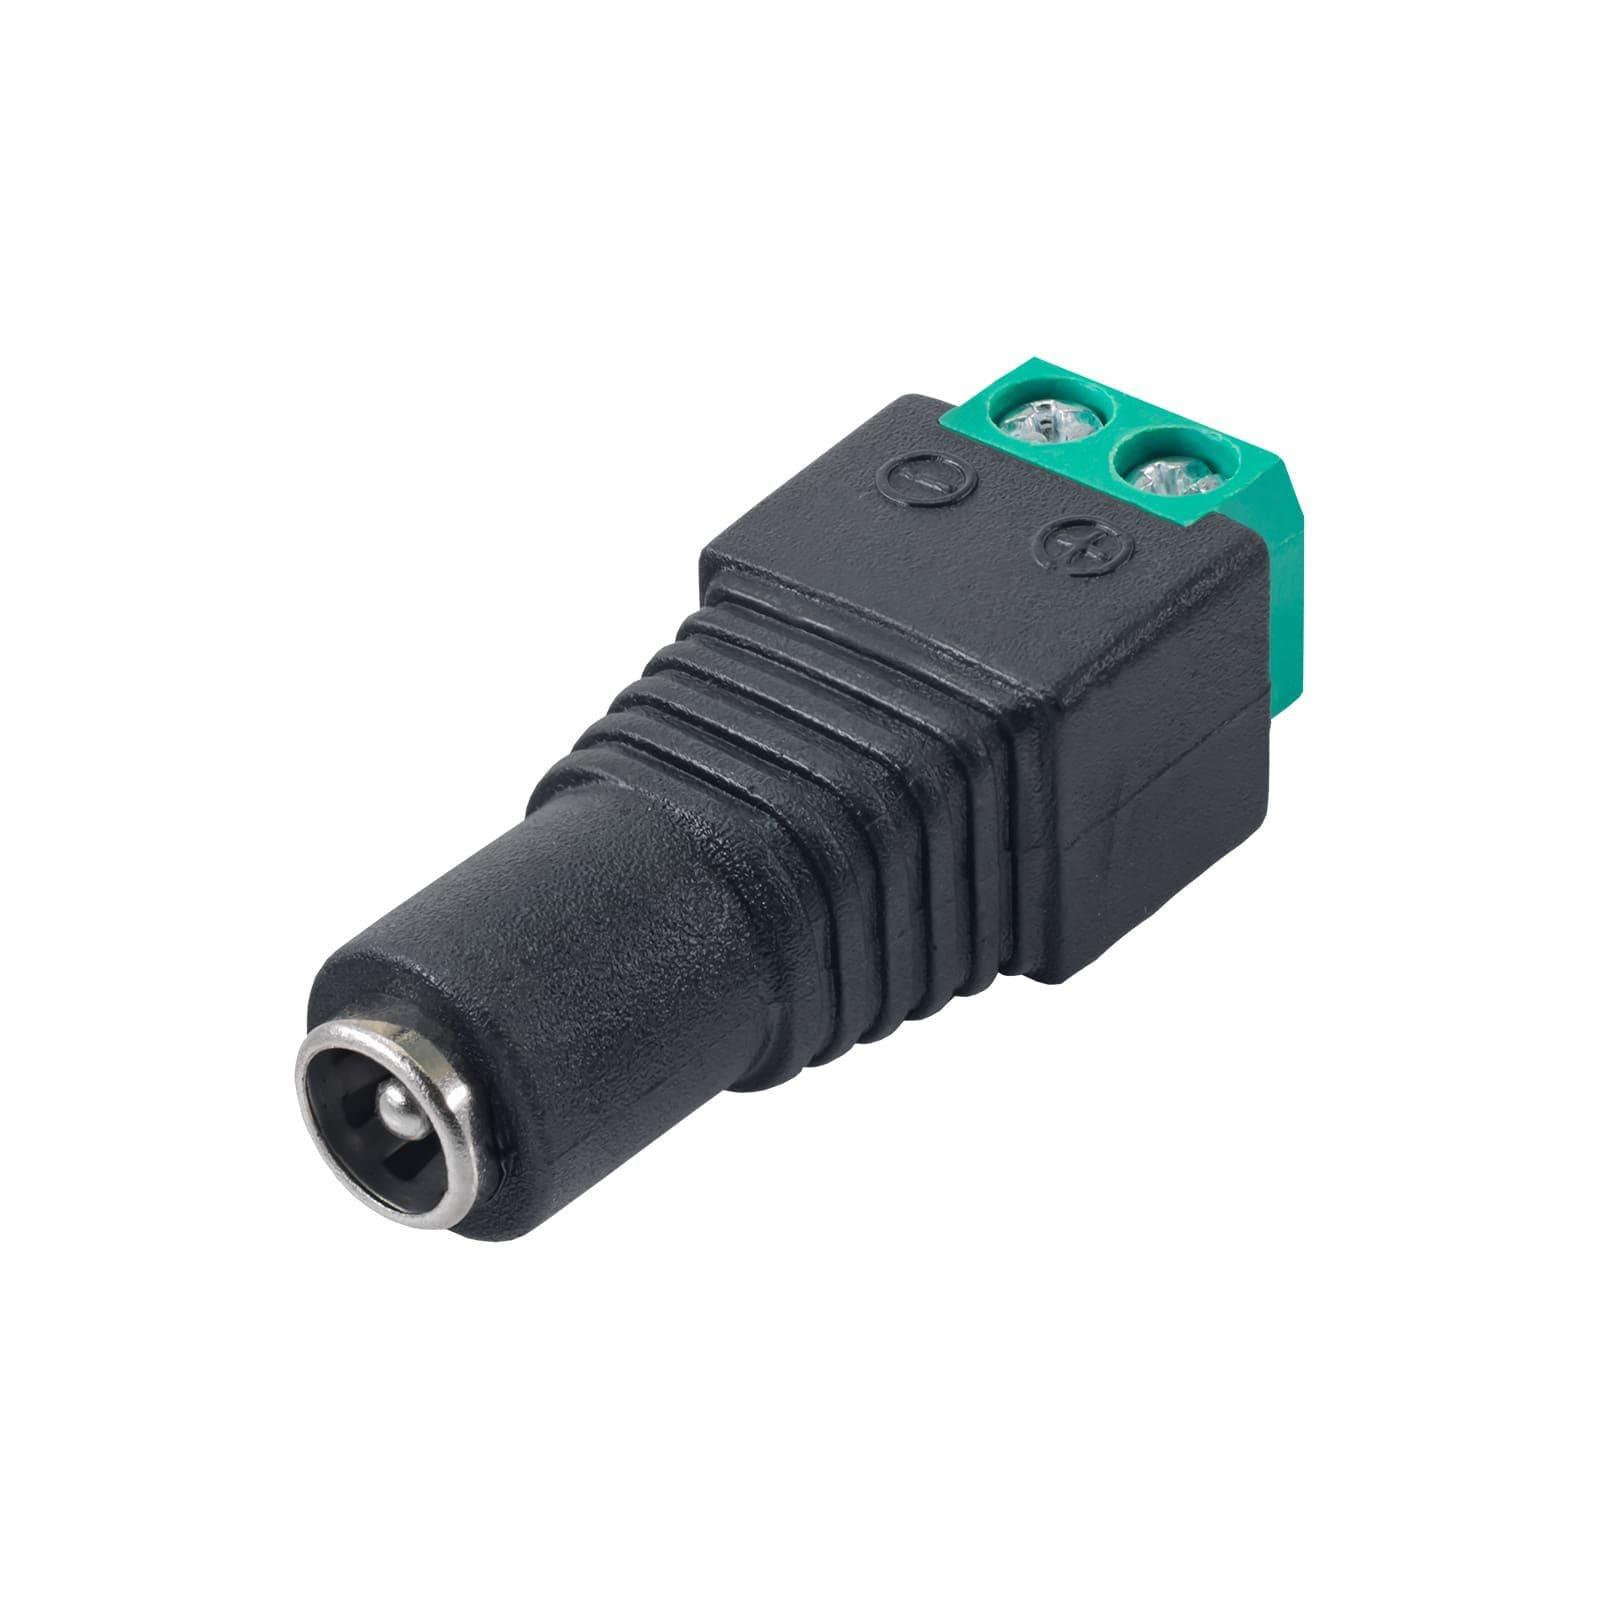 Konektor Skręcany Akyga Ak-Sc-17 5.5 X 2.1 Mm (F) Utp Cctv - 1